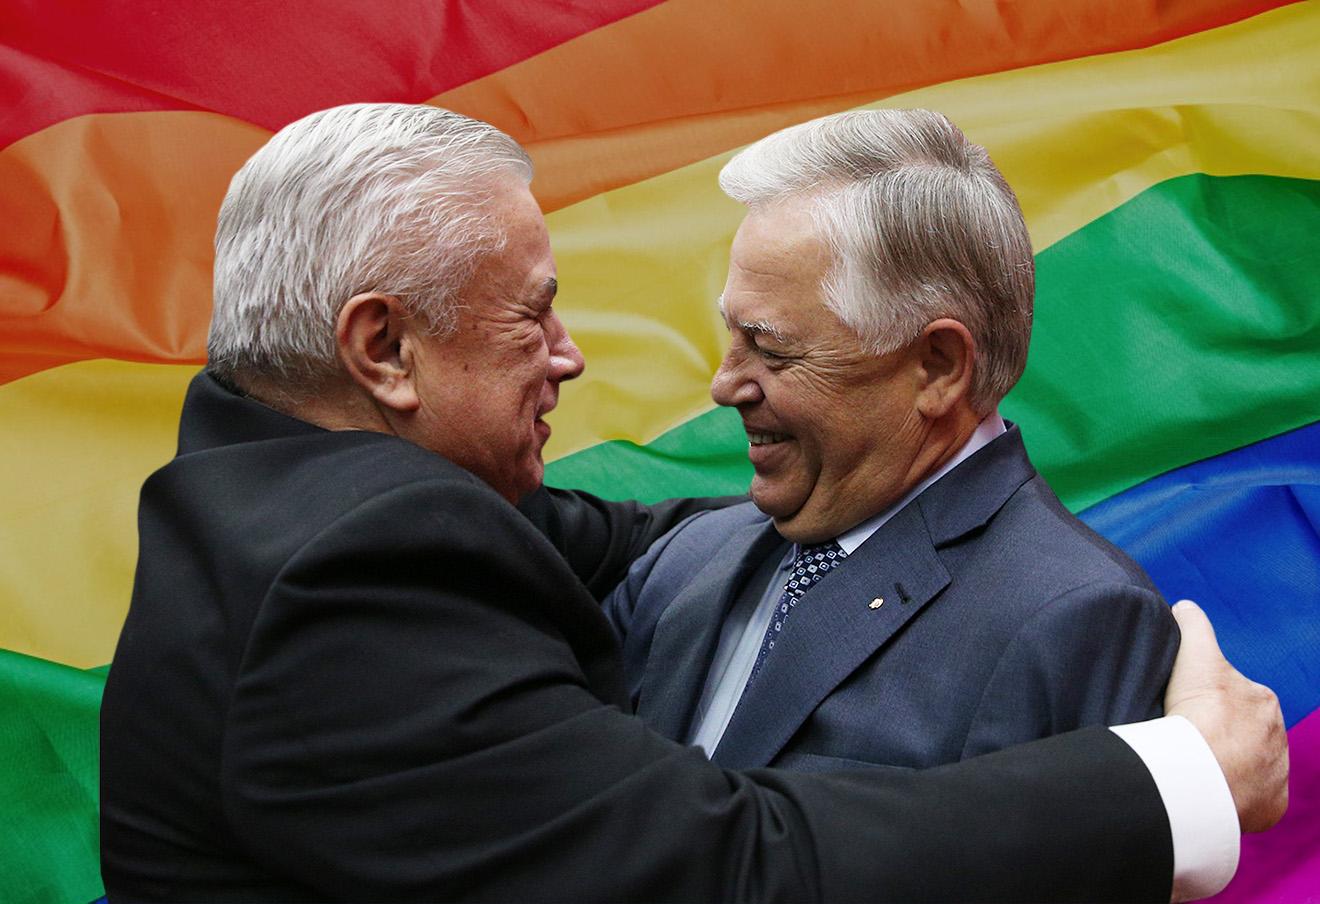 Гомосексуализм это дар божий как болезнь